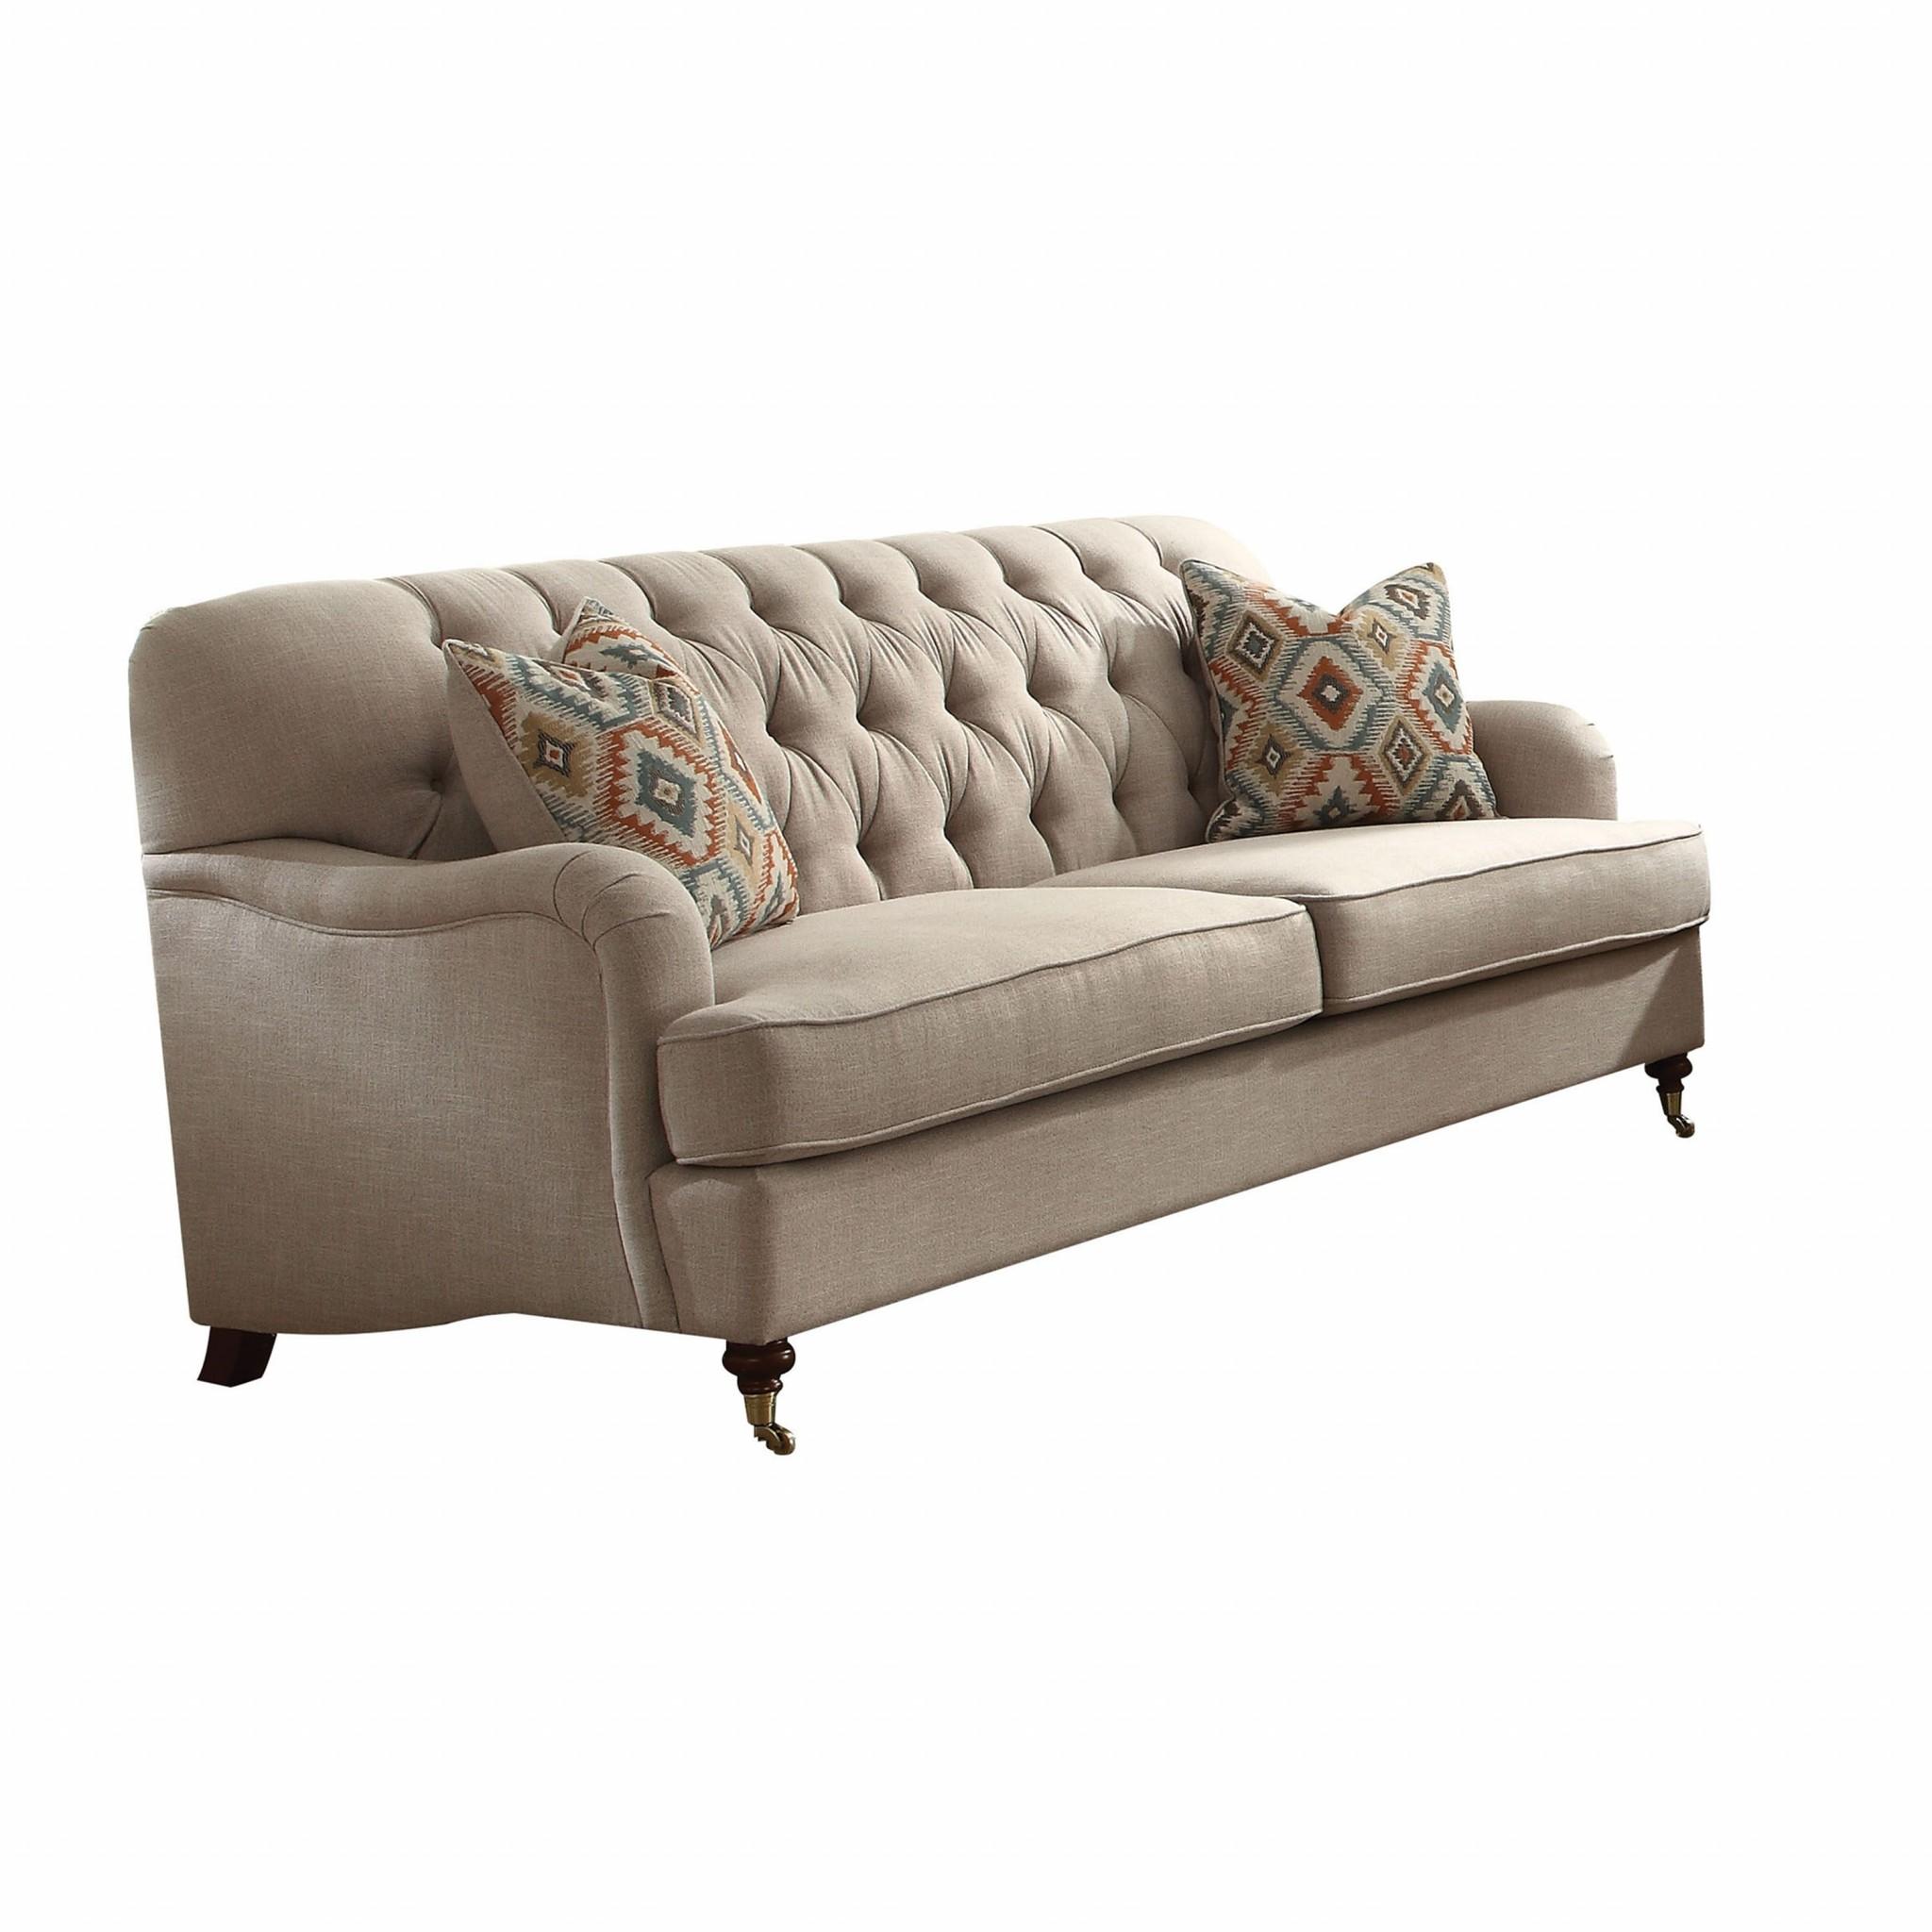 "38"" X 85"" X 37"" Beige Fabric Upholstery Sofa w/2 Pillows"